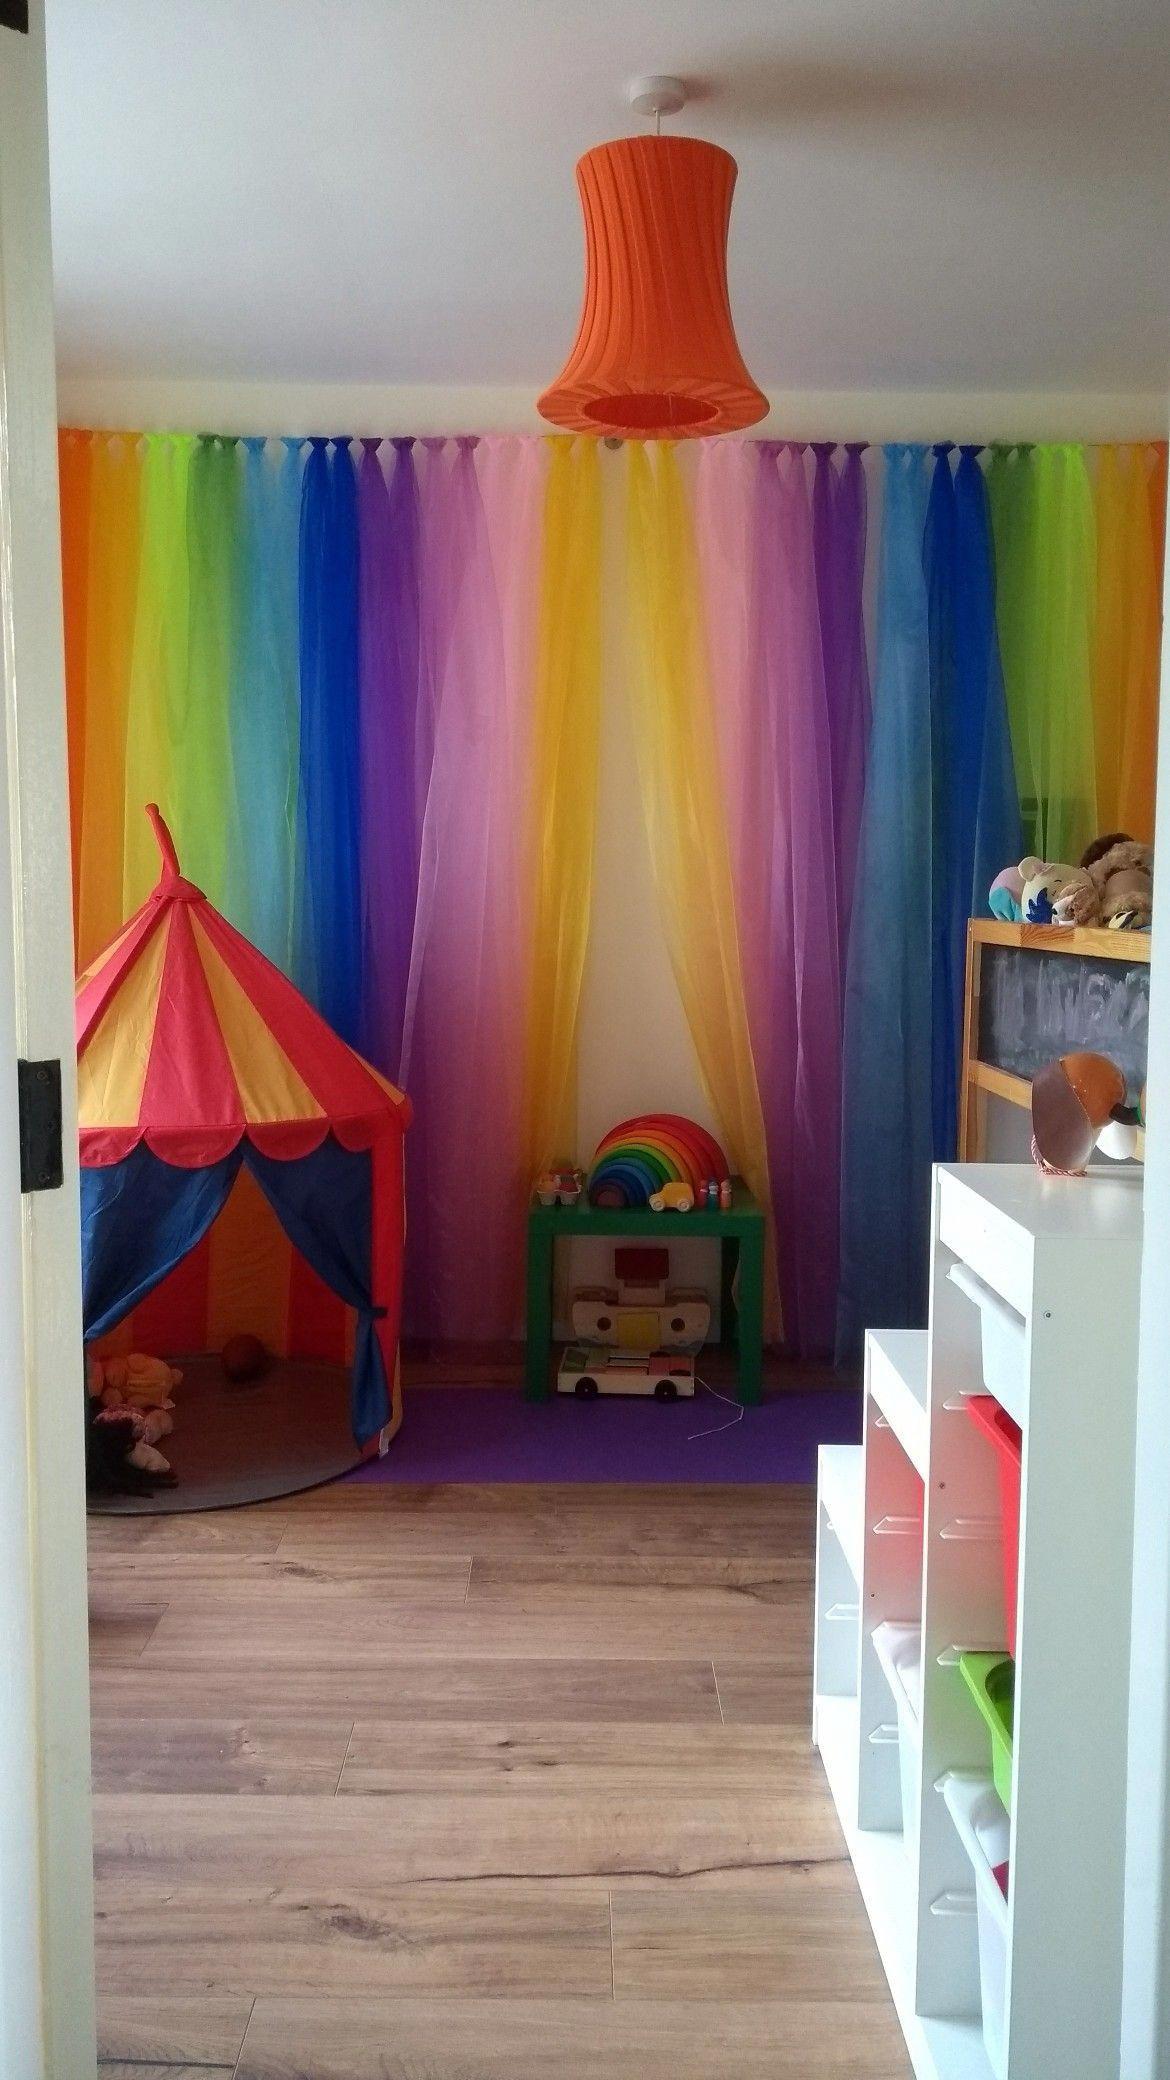 Rainbow Wall Curtain Playroom Space Ikea Circus Tent